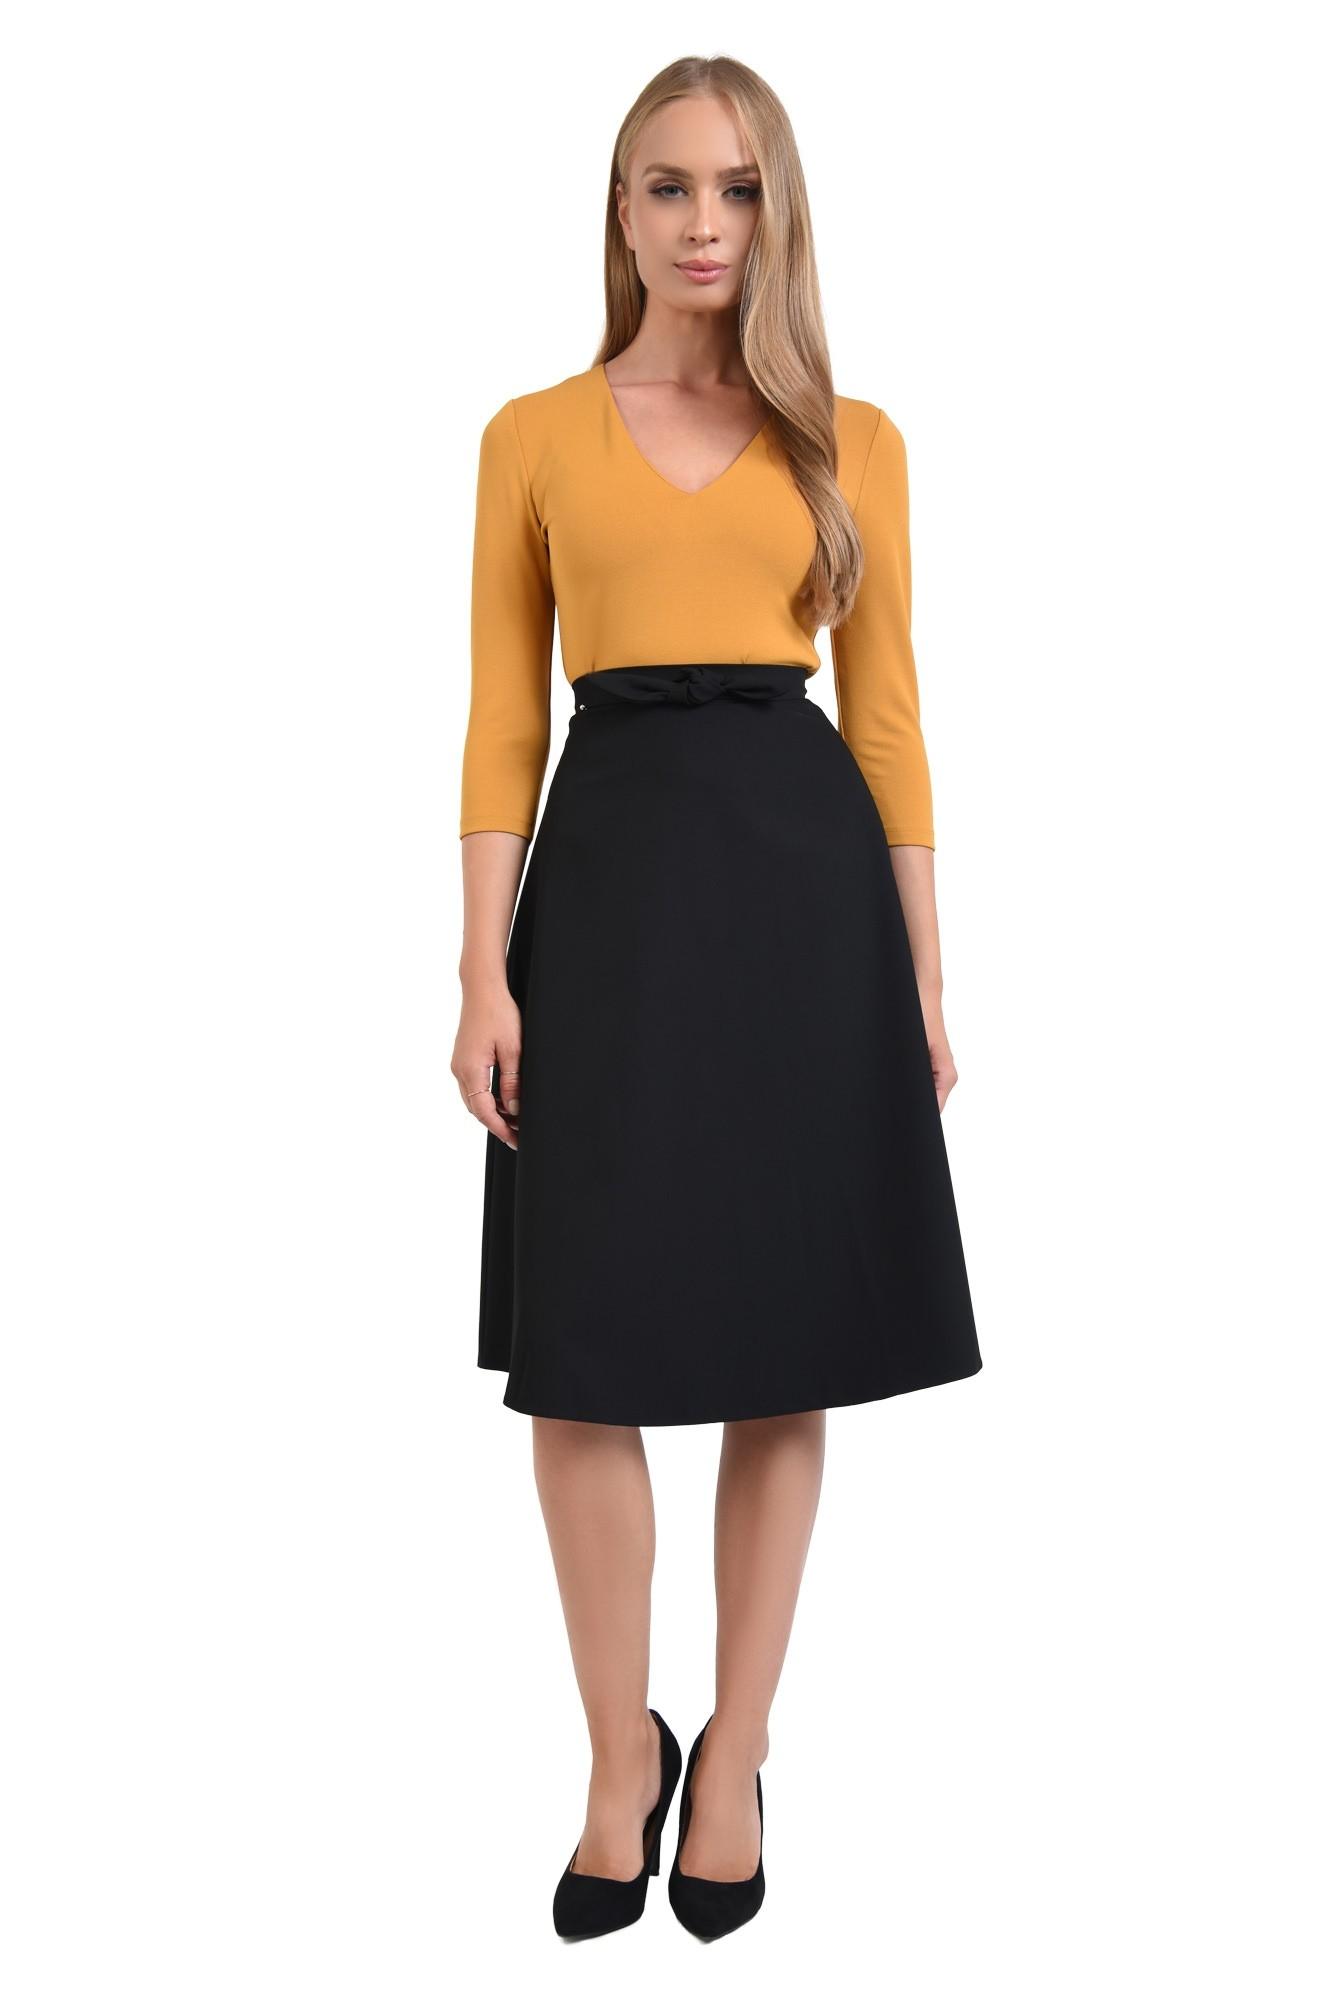 3 - 360 - bluza casual mustar, decoltata, croi drept, anchior, tesatura elastica